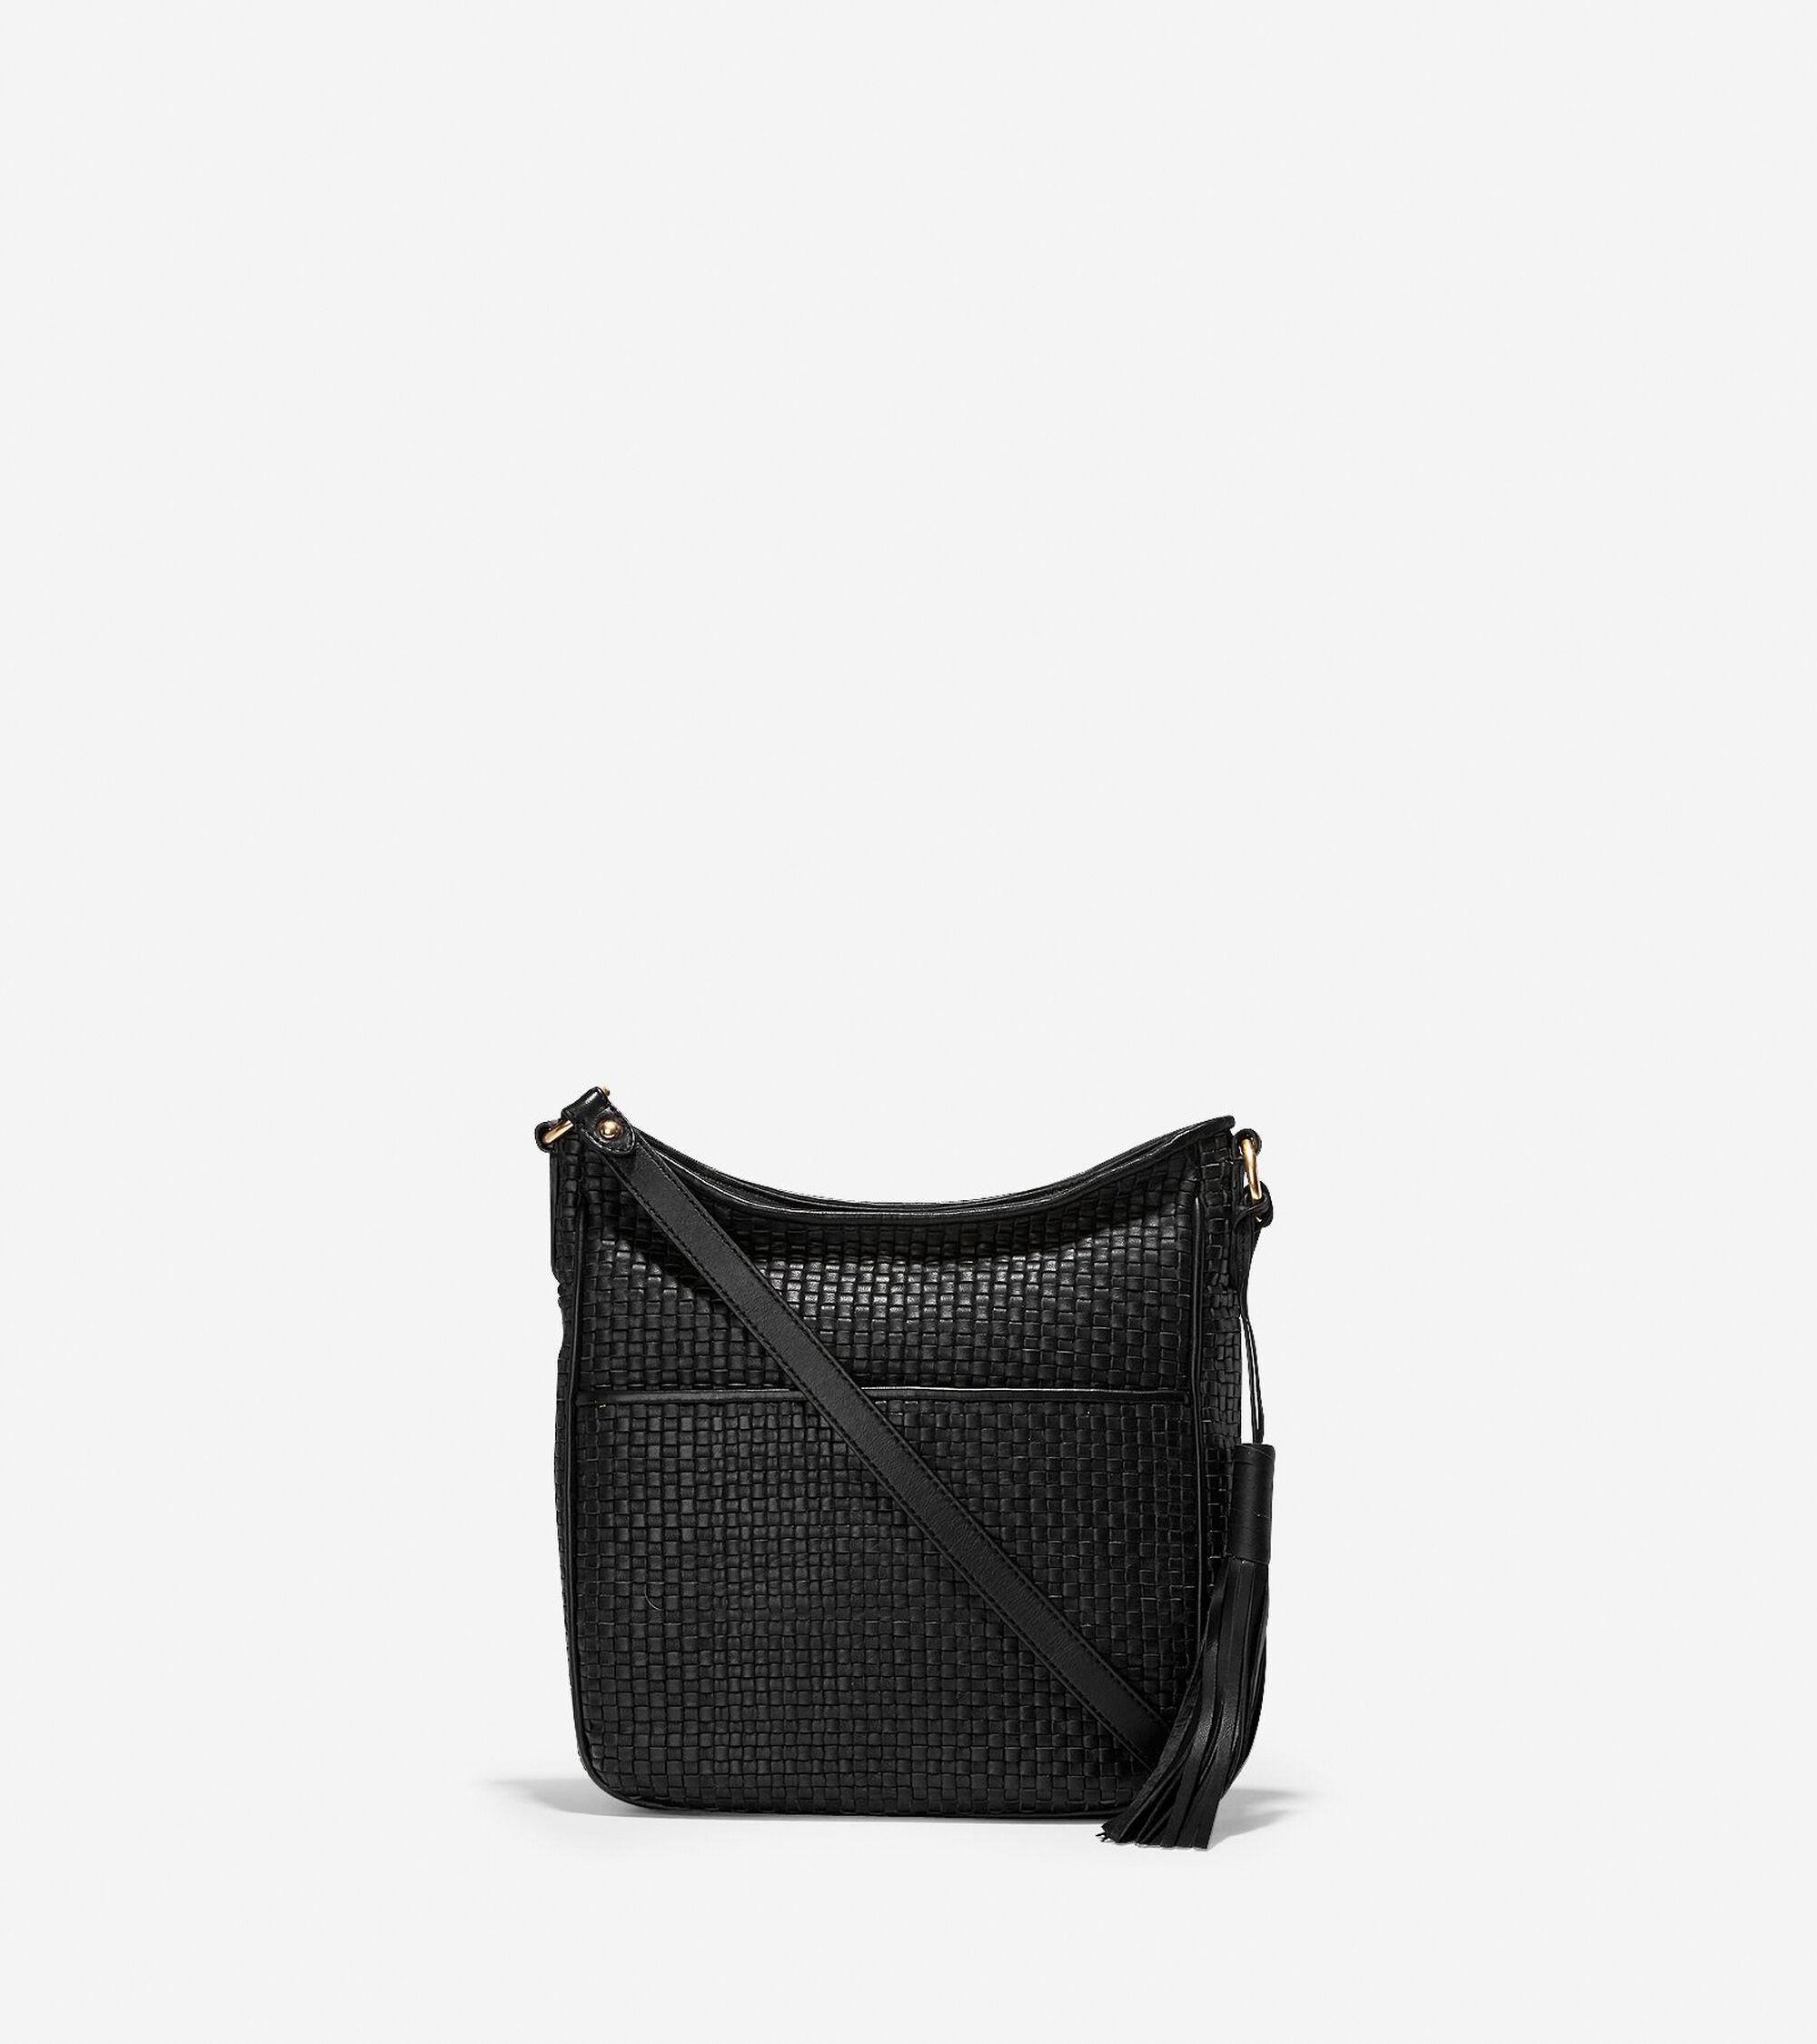 ecbcb970f4 Women s Gabriella Weave Crossbody in Black Leather